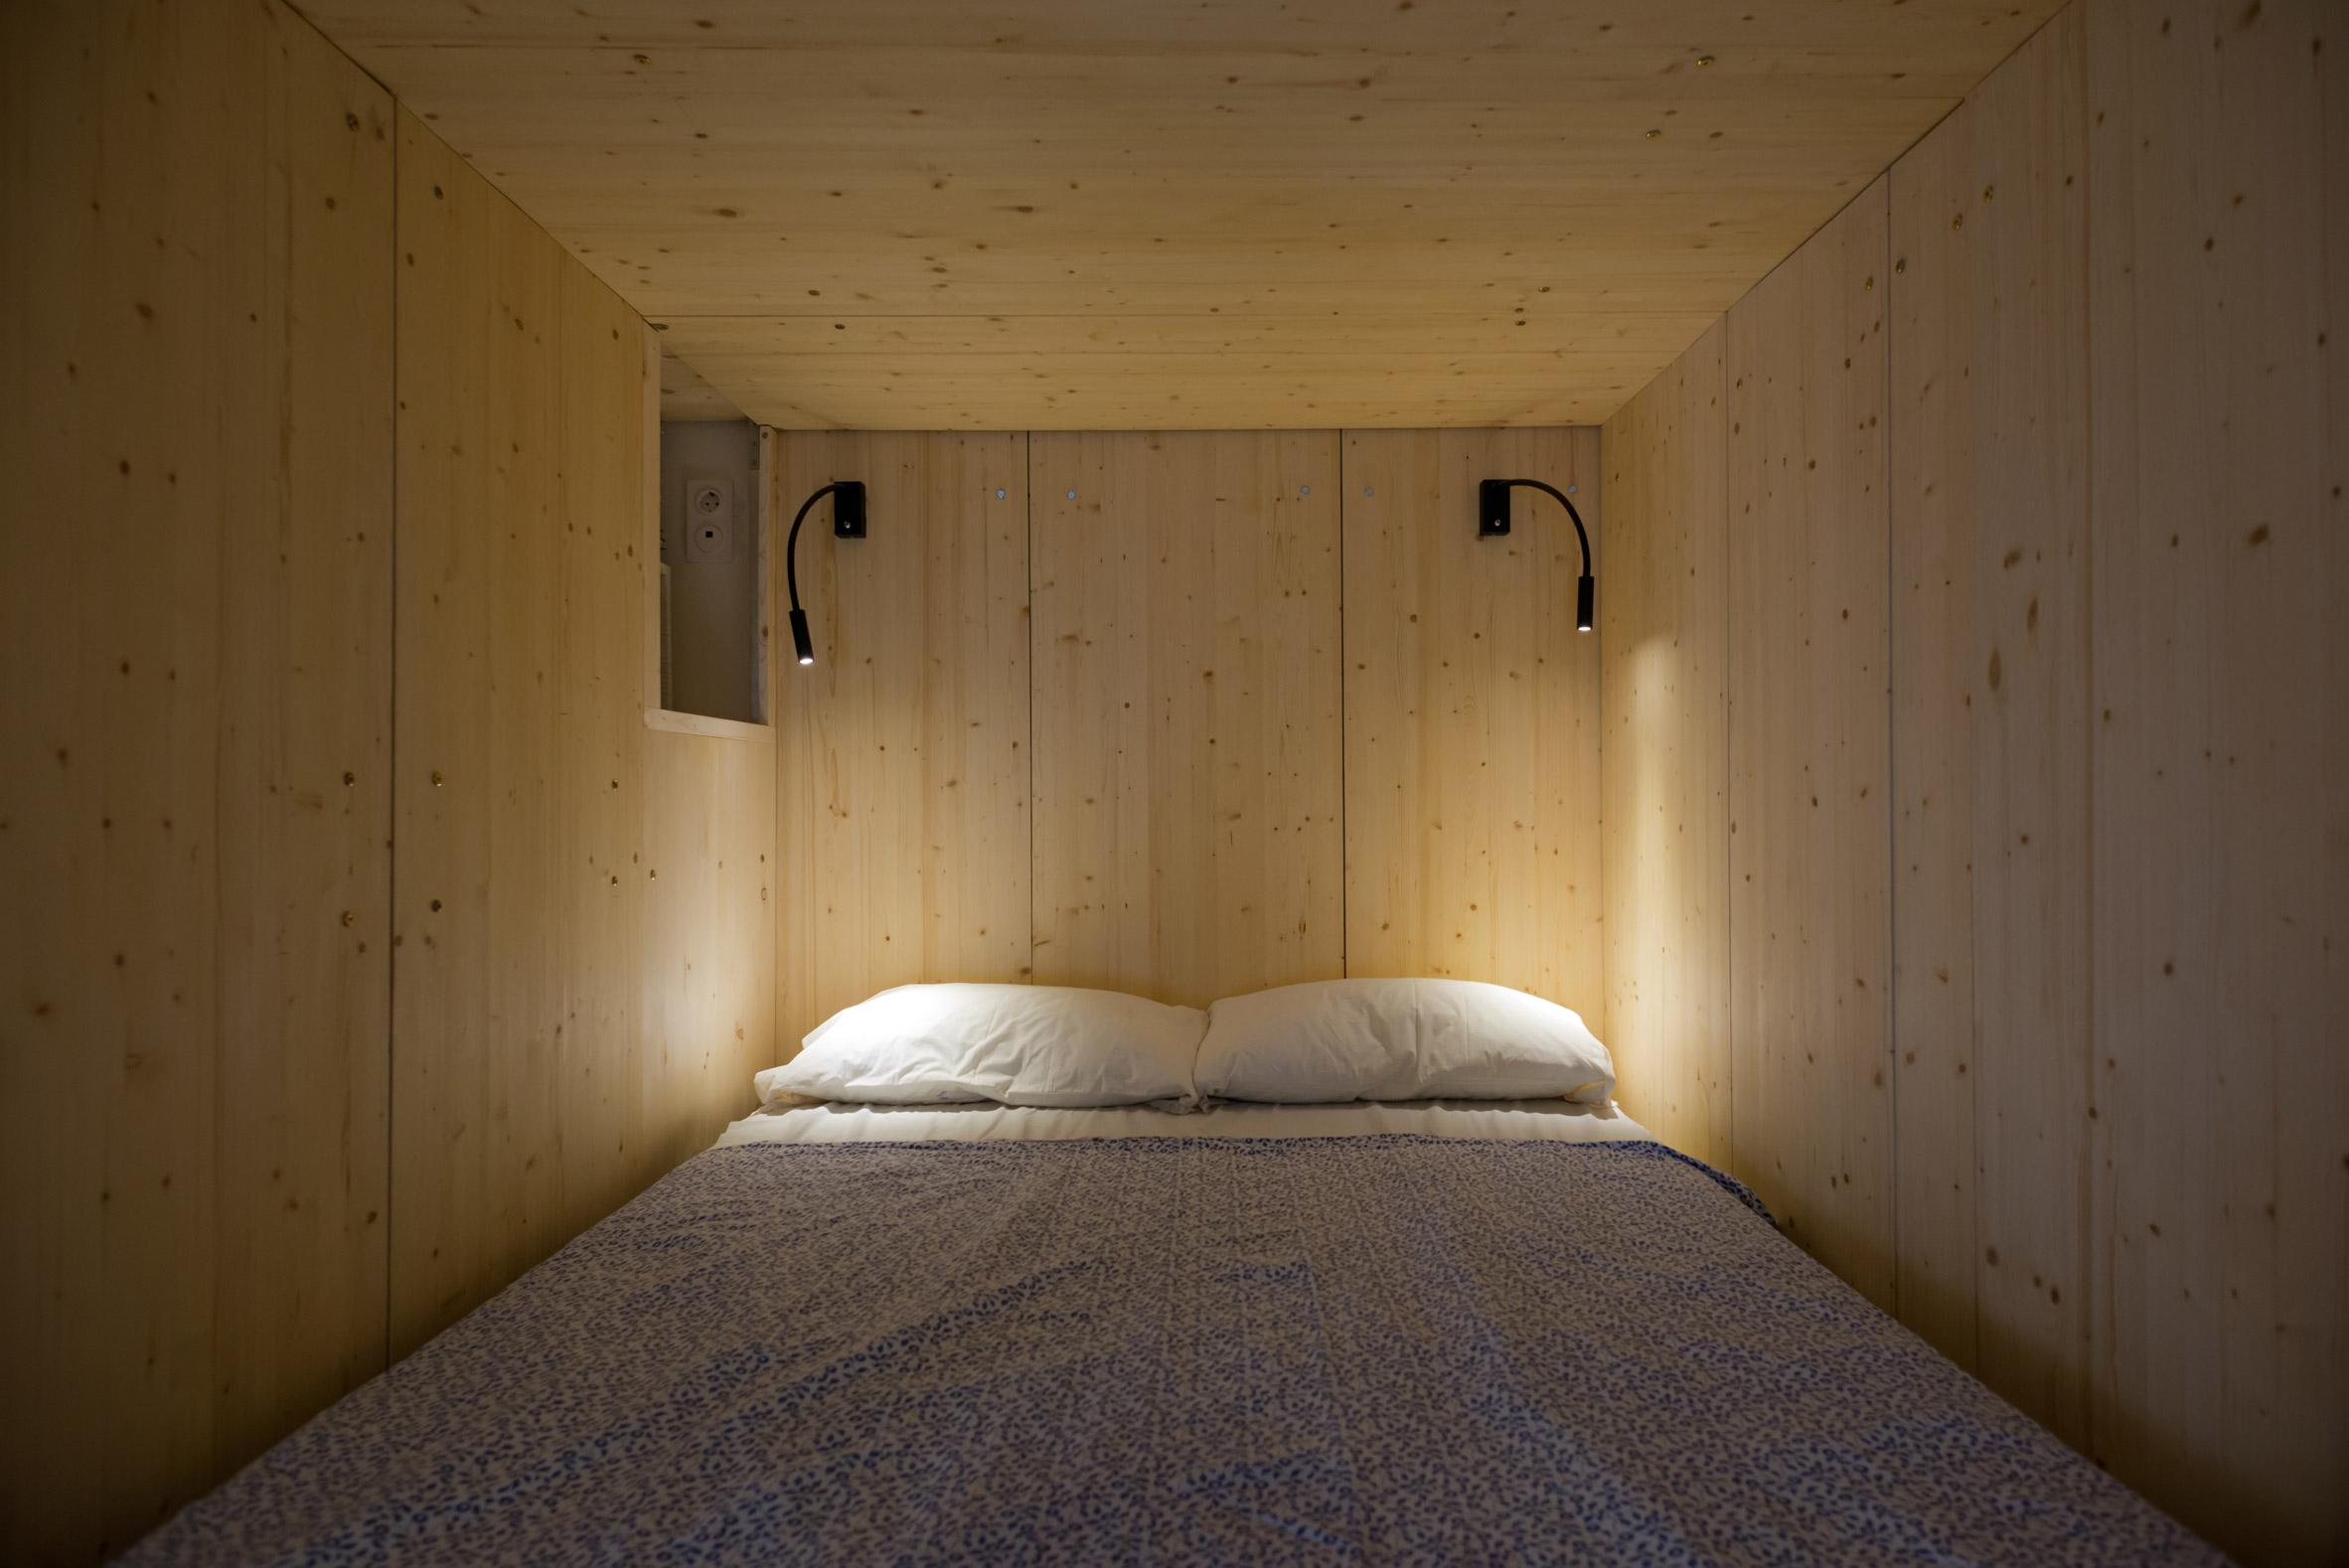 Micro apartment sleeping area